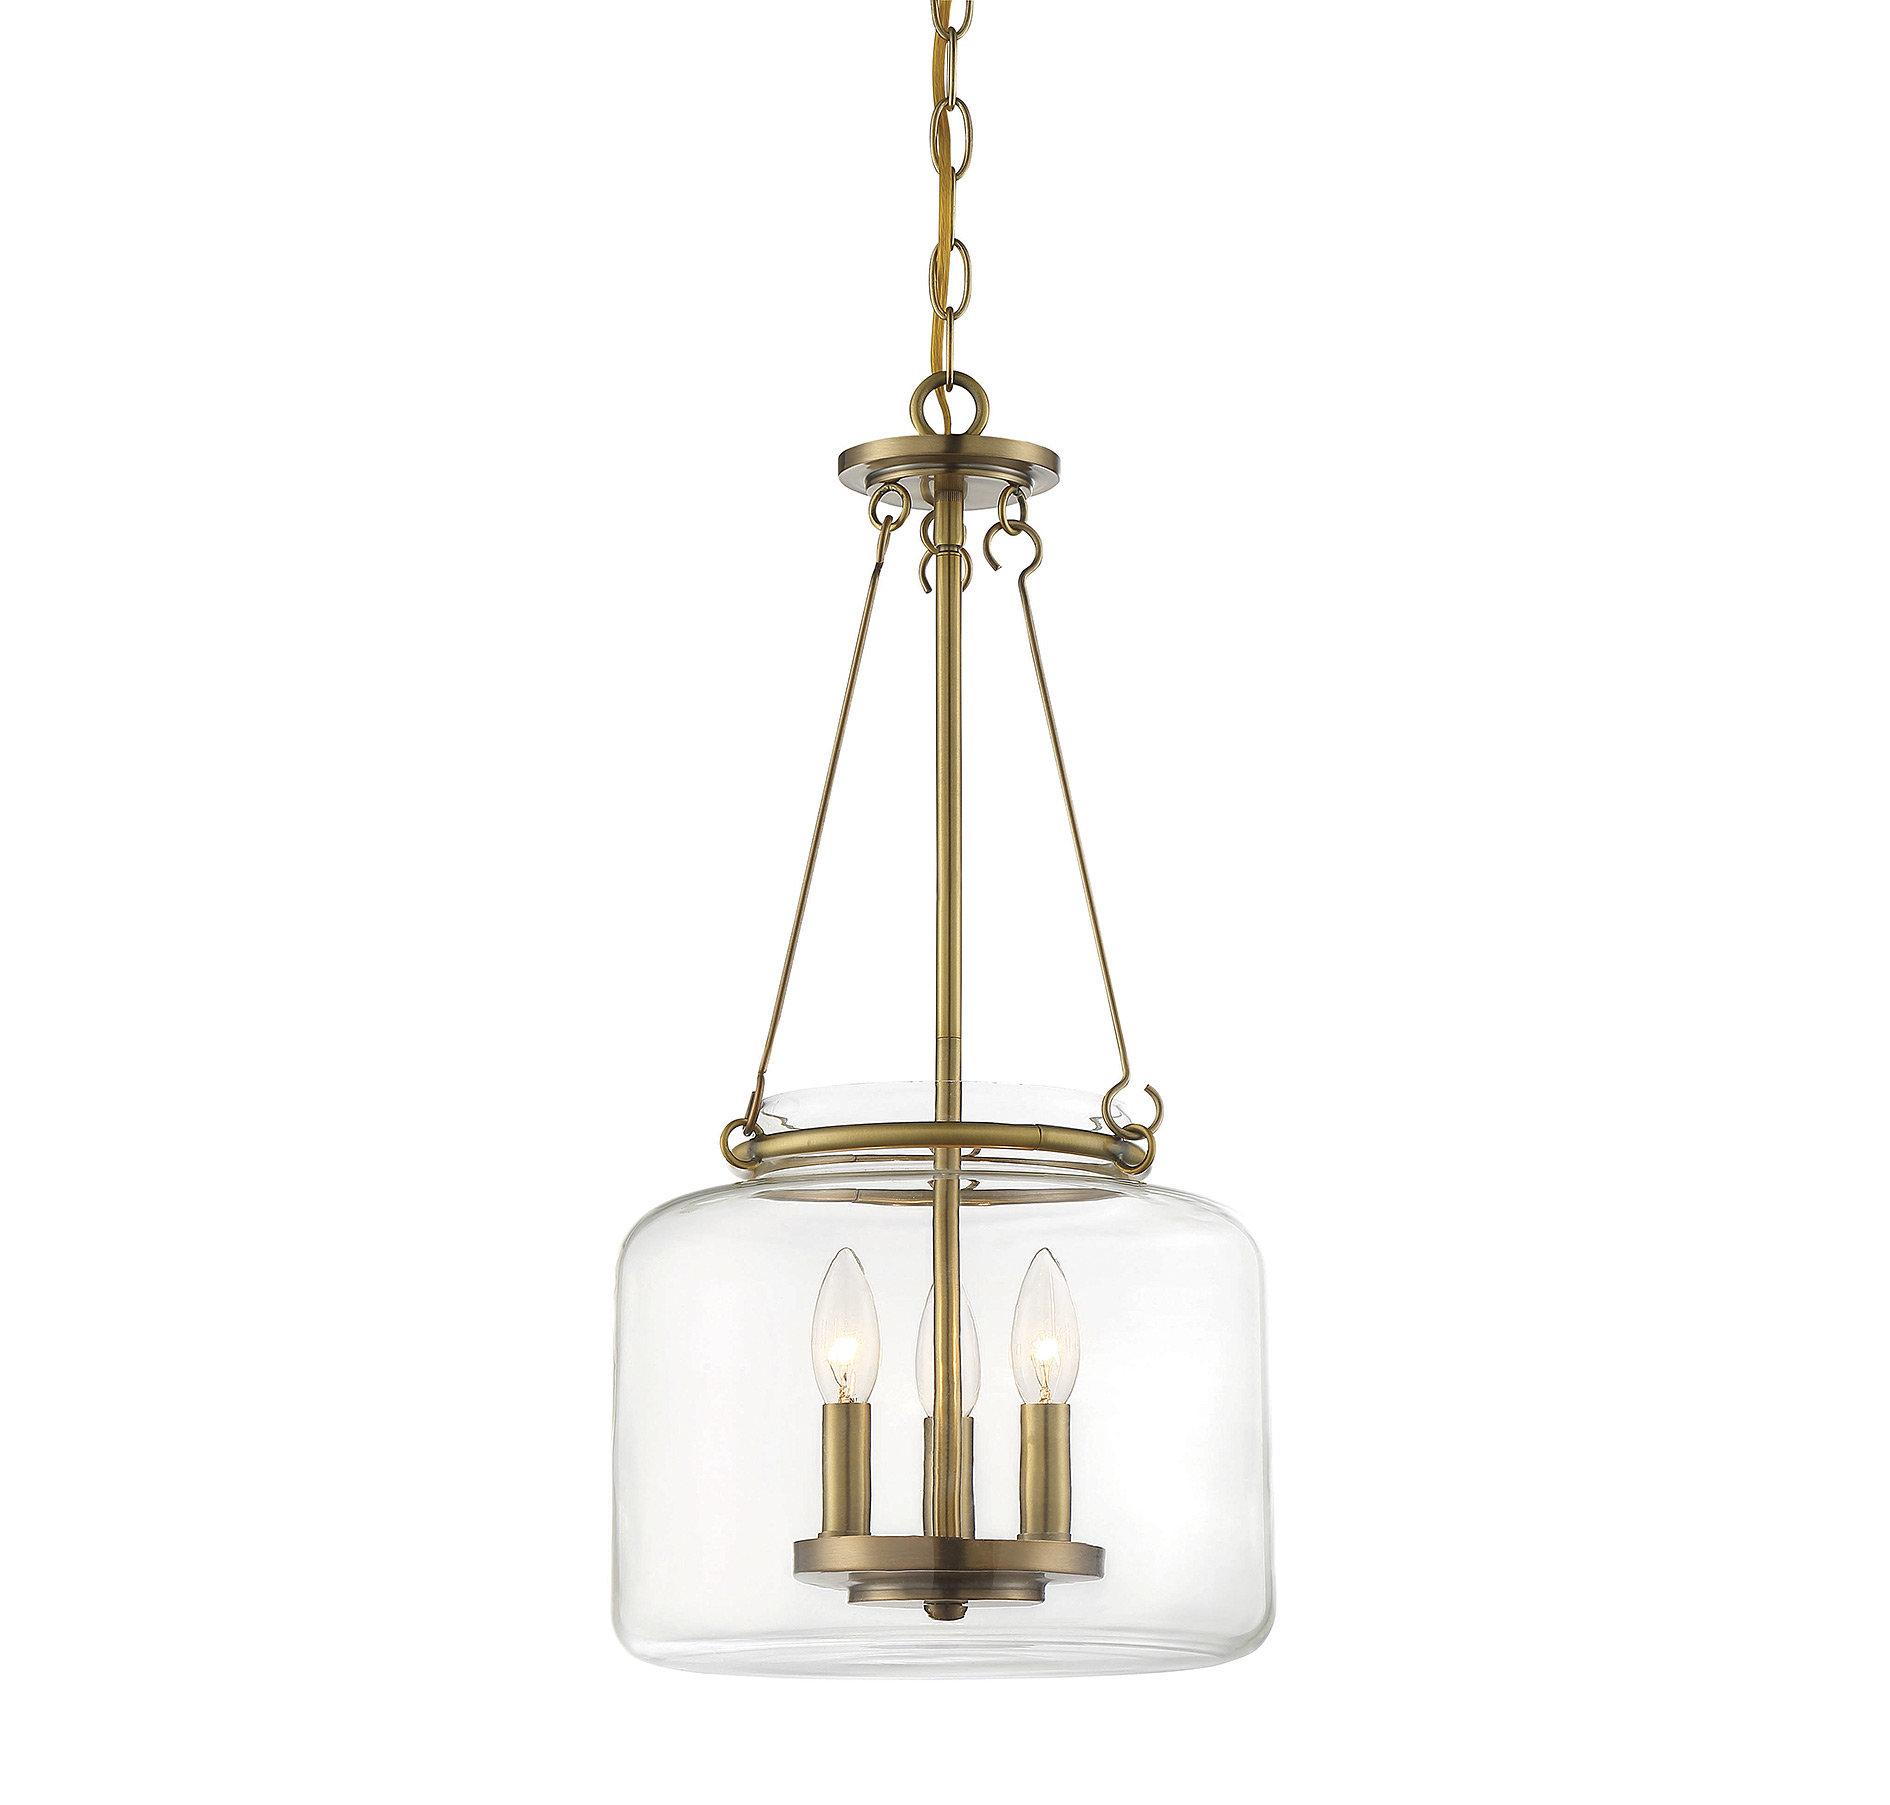 Laurel Foundry Modern Farmhouse Jean-Baptiste 3-Light Single Jar Pendant intended for Clematite 1-Light Single Jar Pendants (Image 21 of 30)